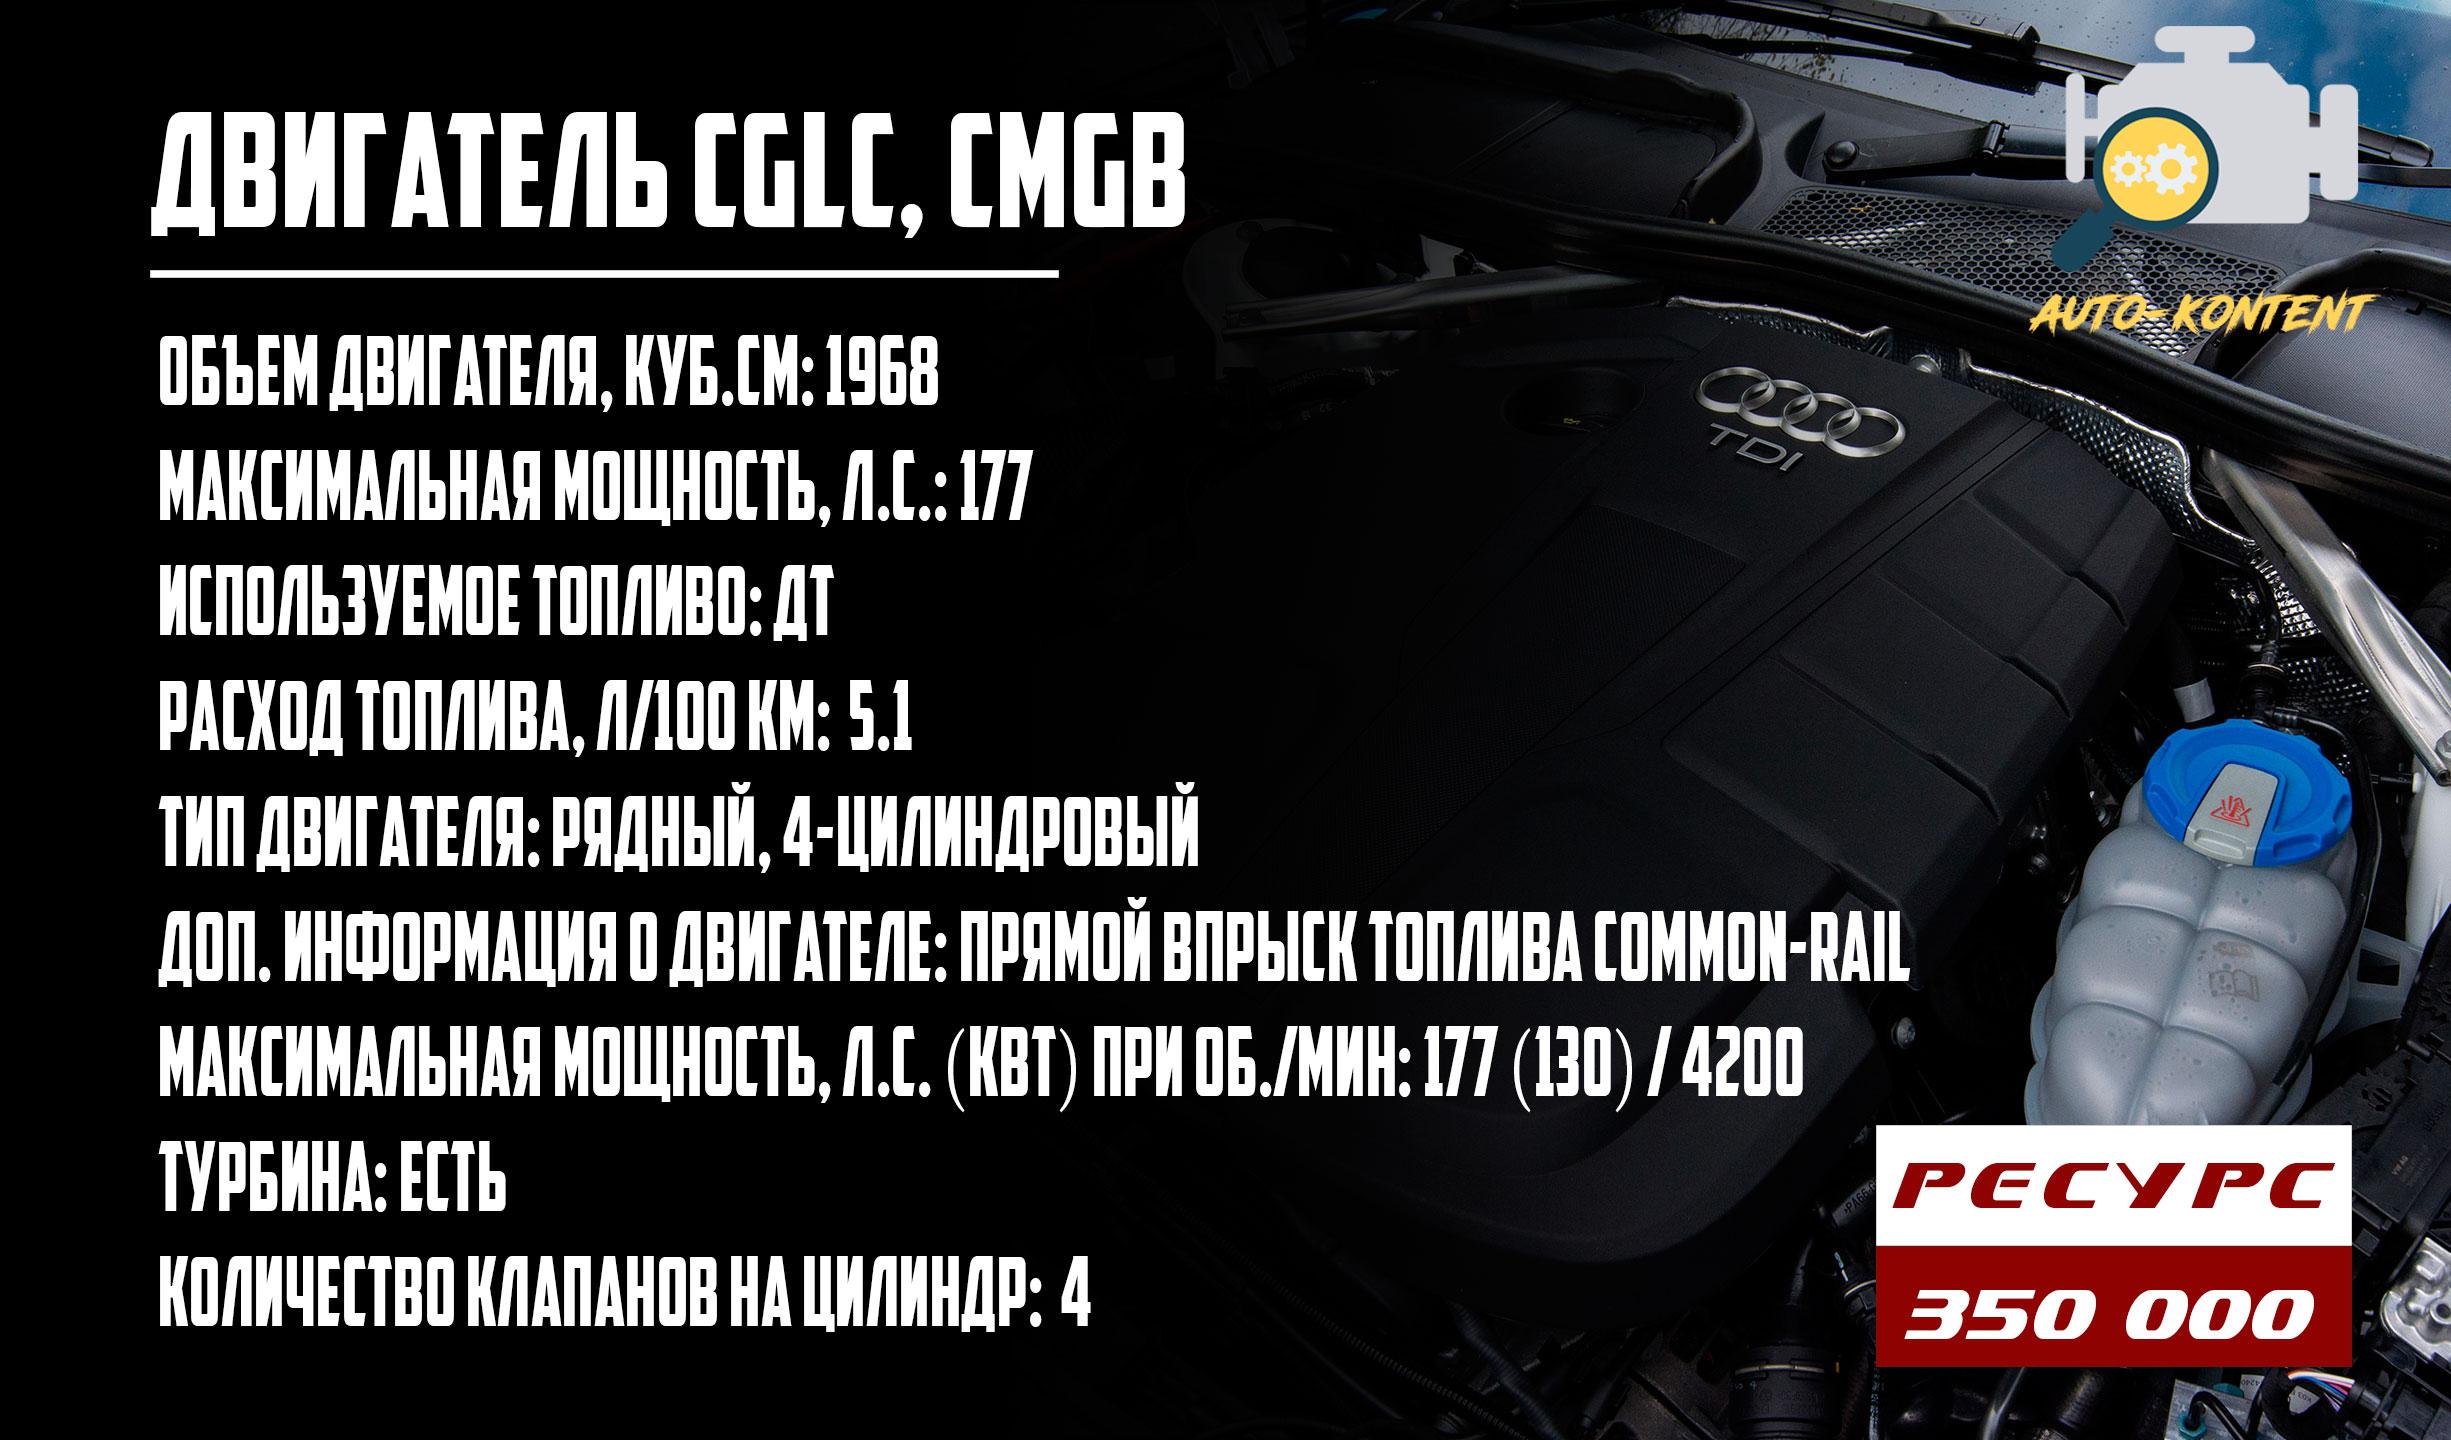 CGLC, CMGB